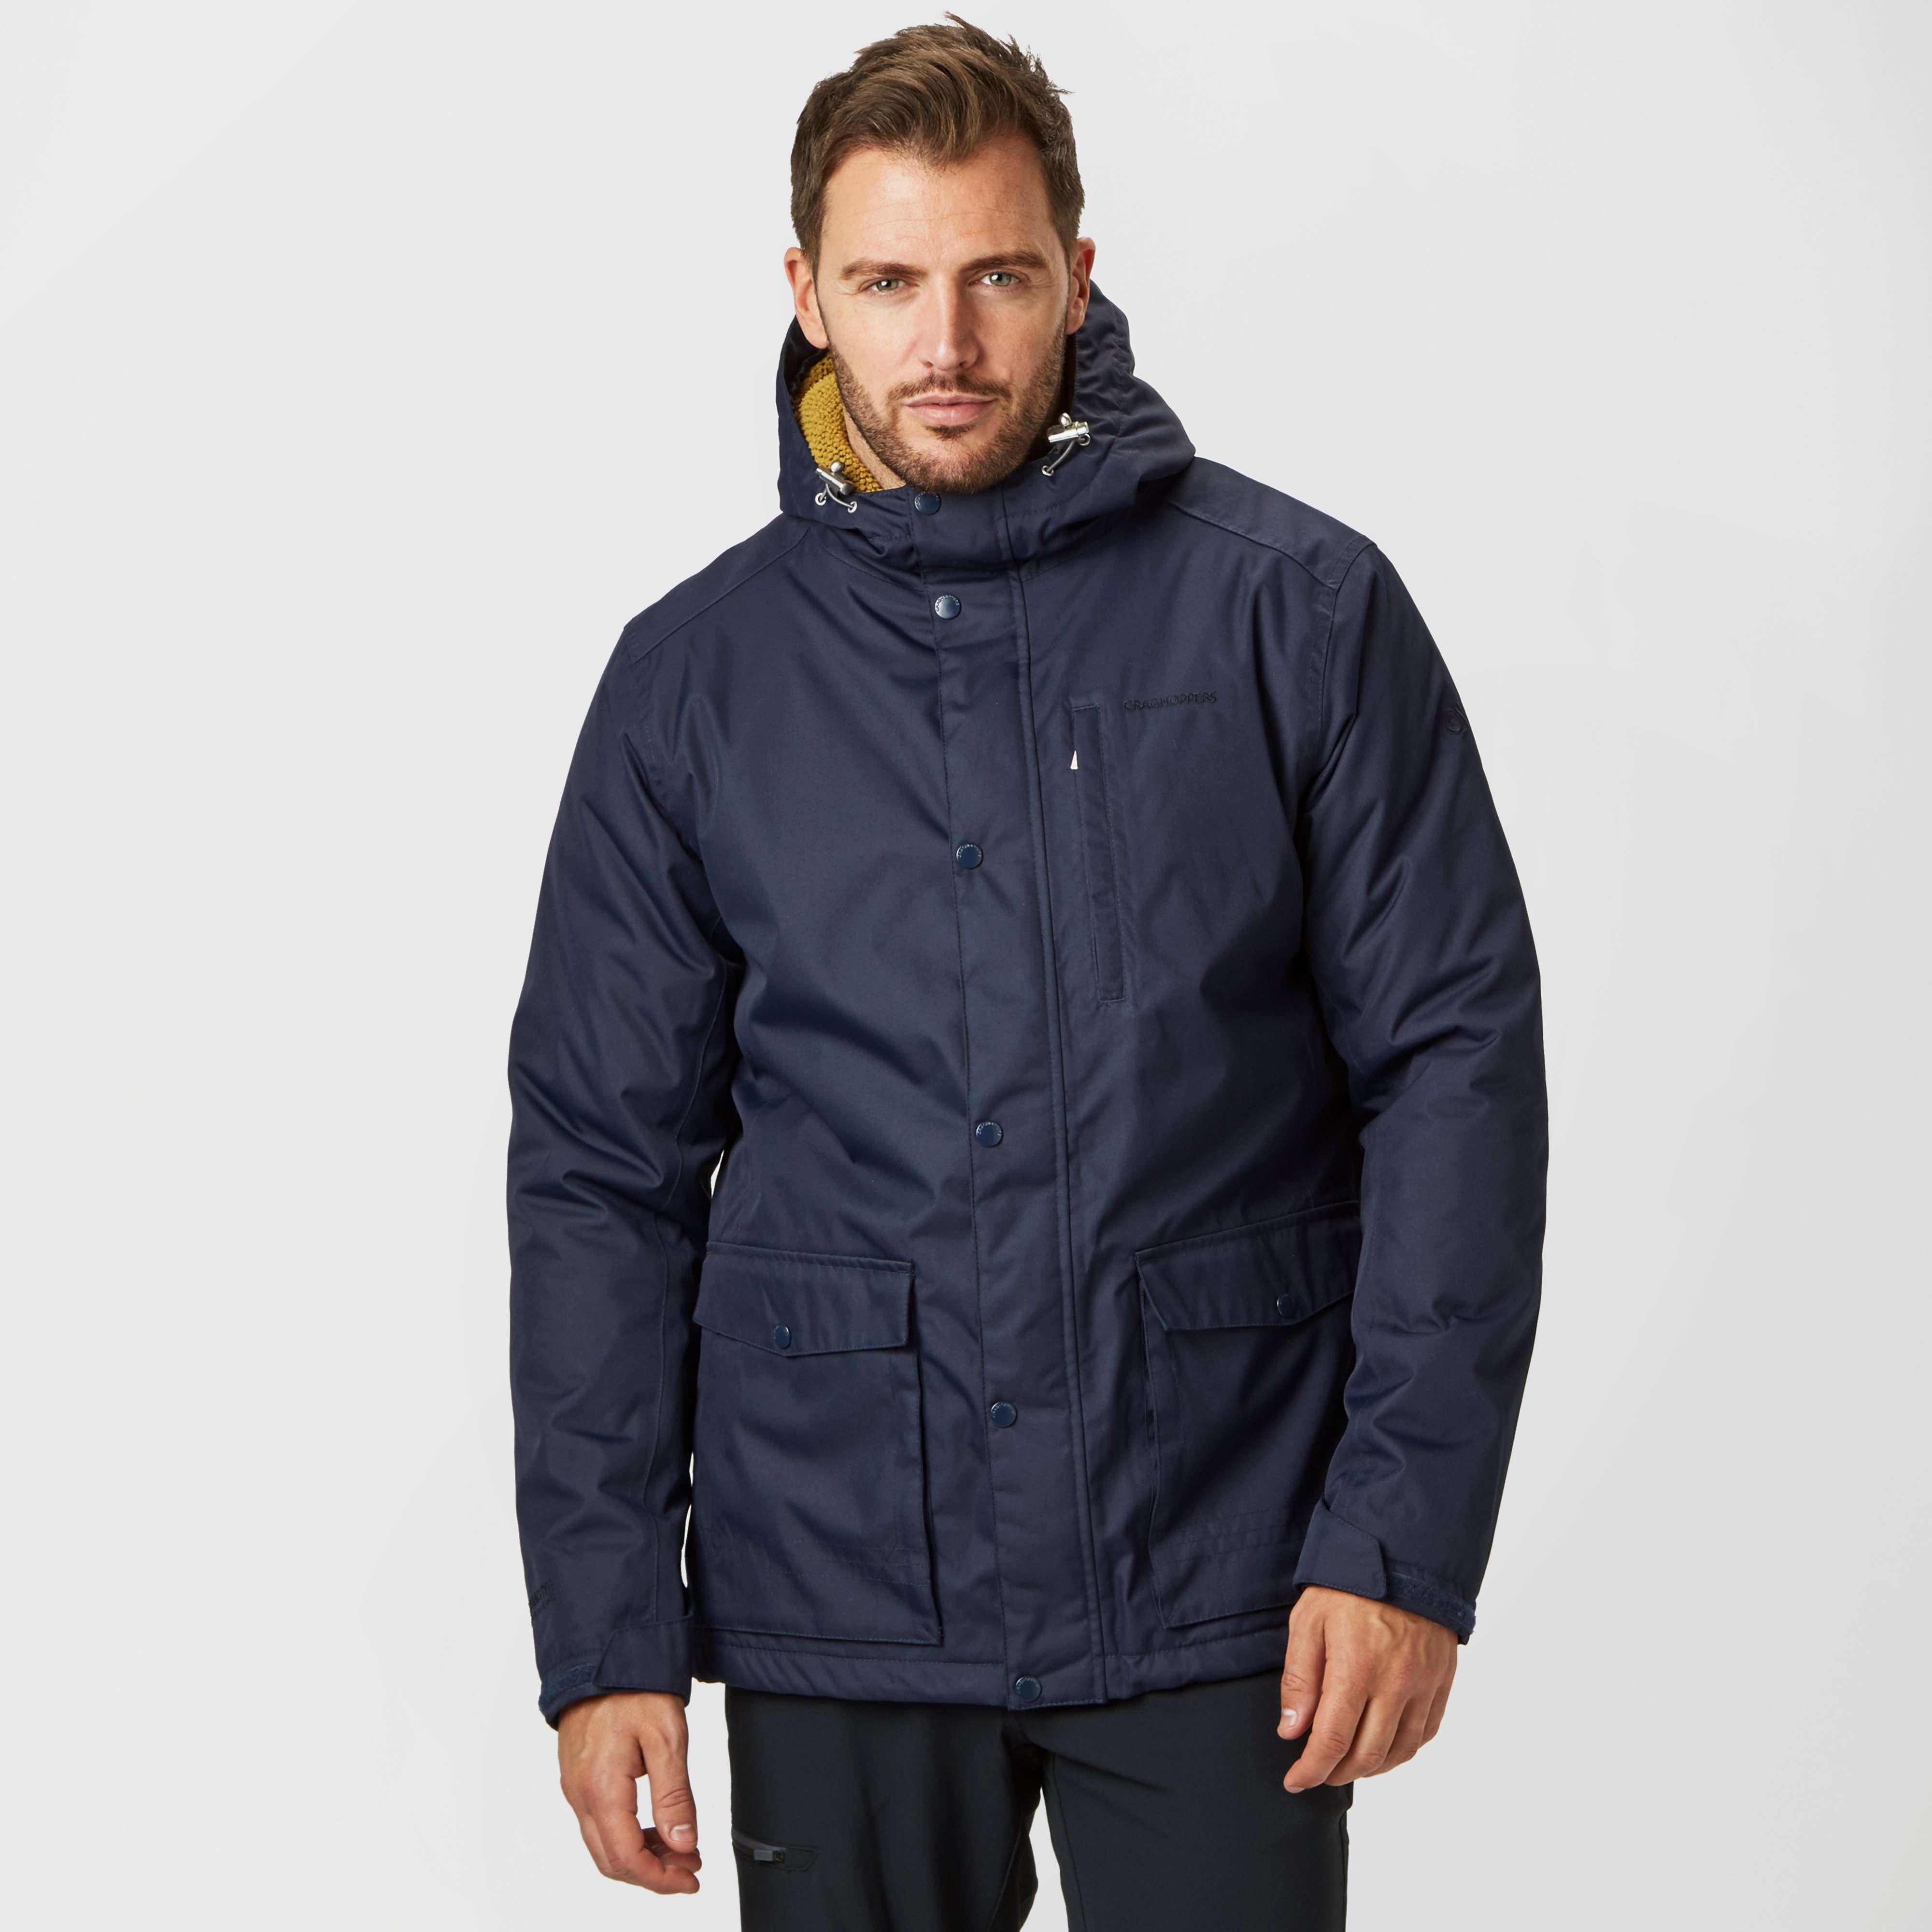 CRAGHOPPERS Men's Kiwi Thermic Jacket